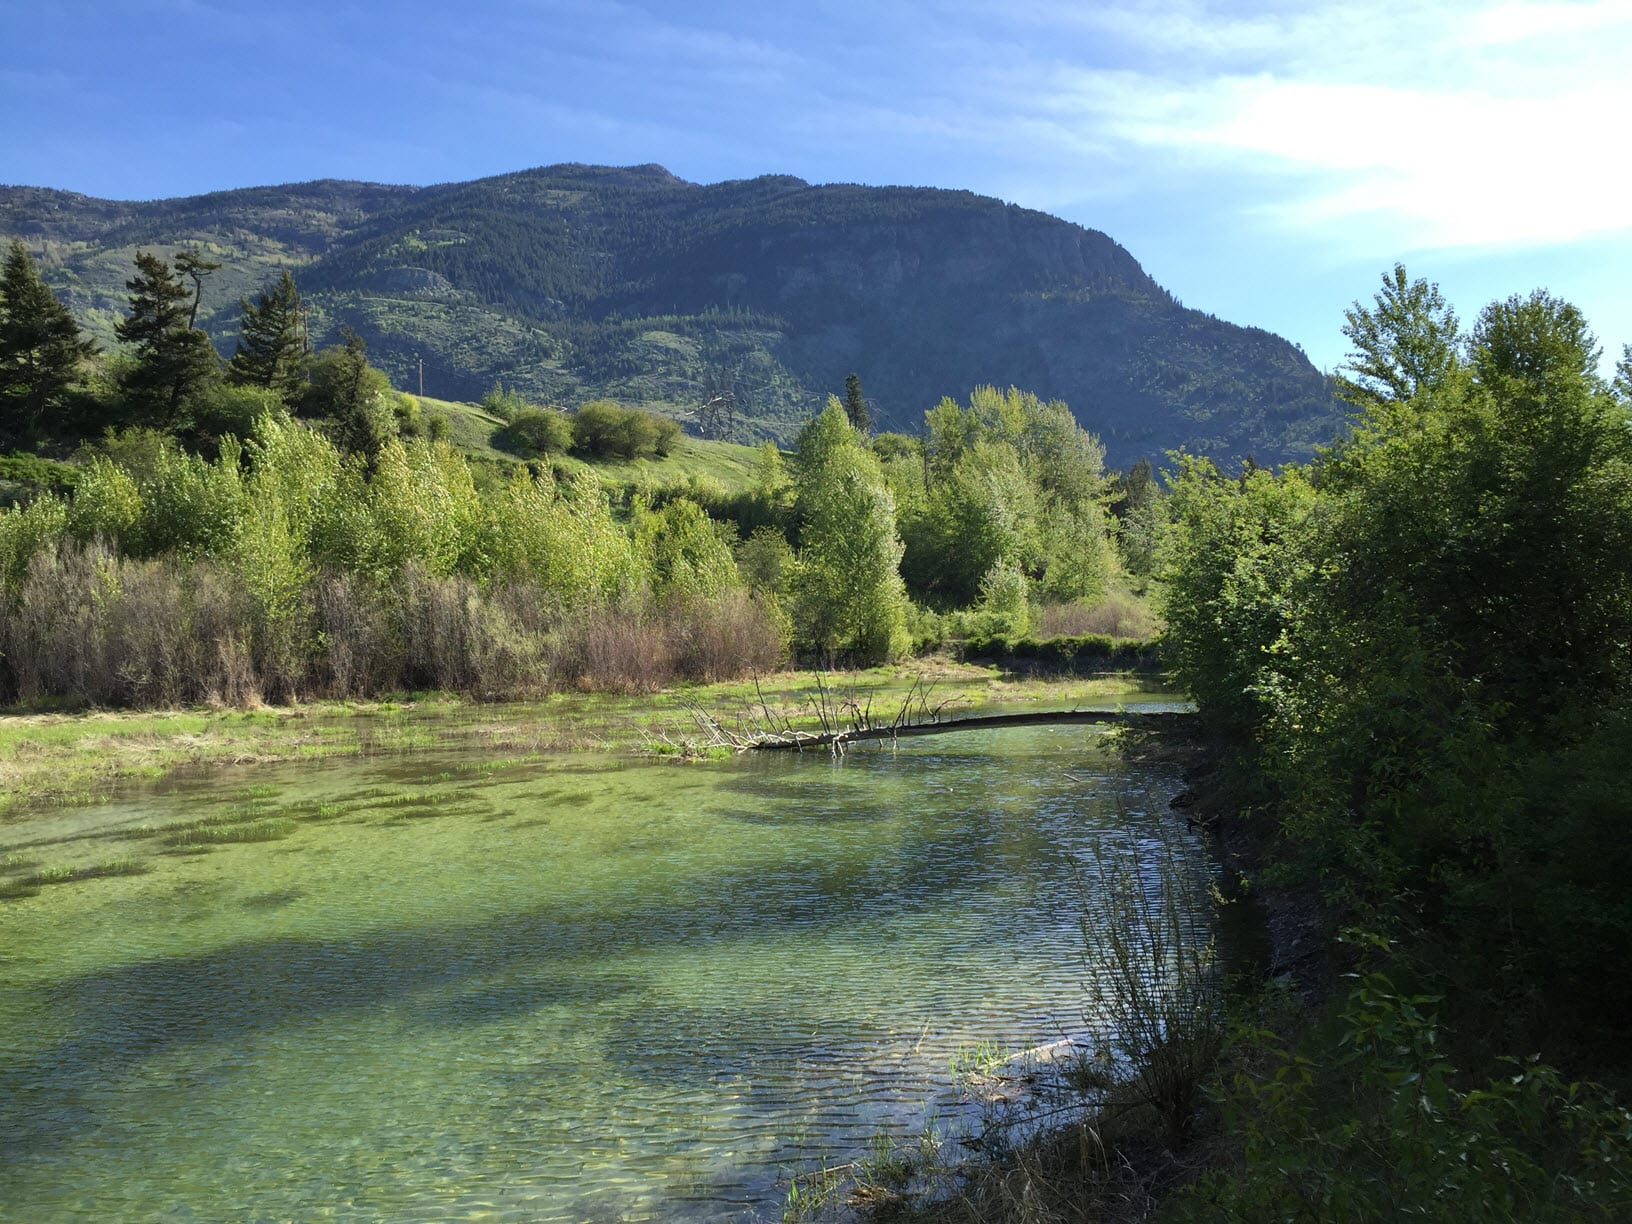 Roux on Location: Columbia Falls, Montana